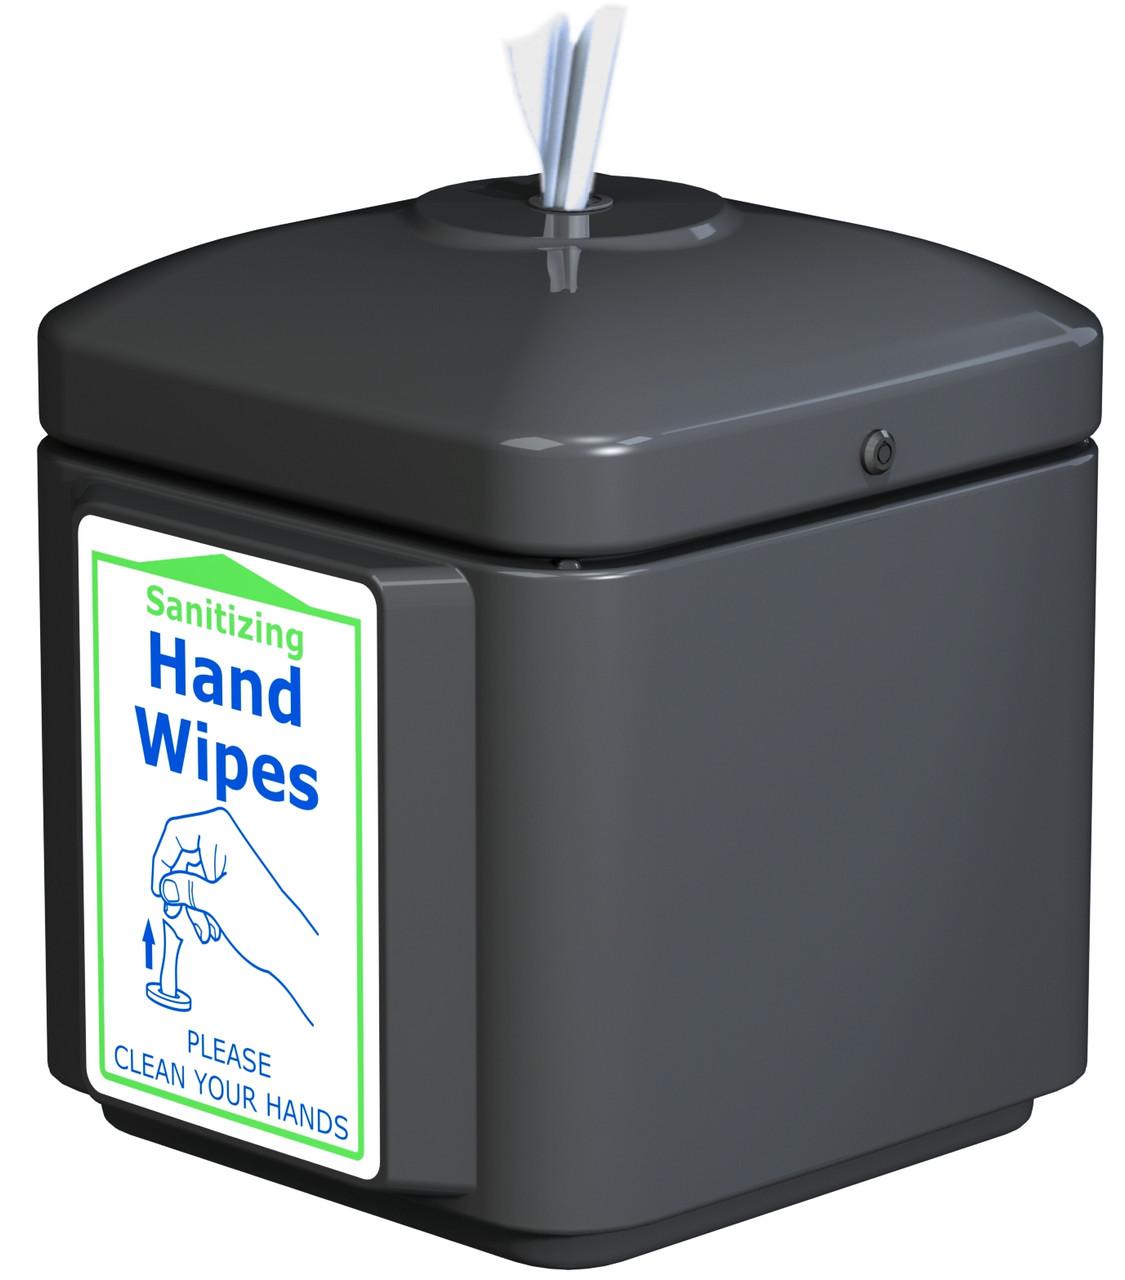 Sanitizing Wipe Dispenser Table Top 8003266 (BLACK, No Wipes)